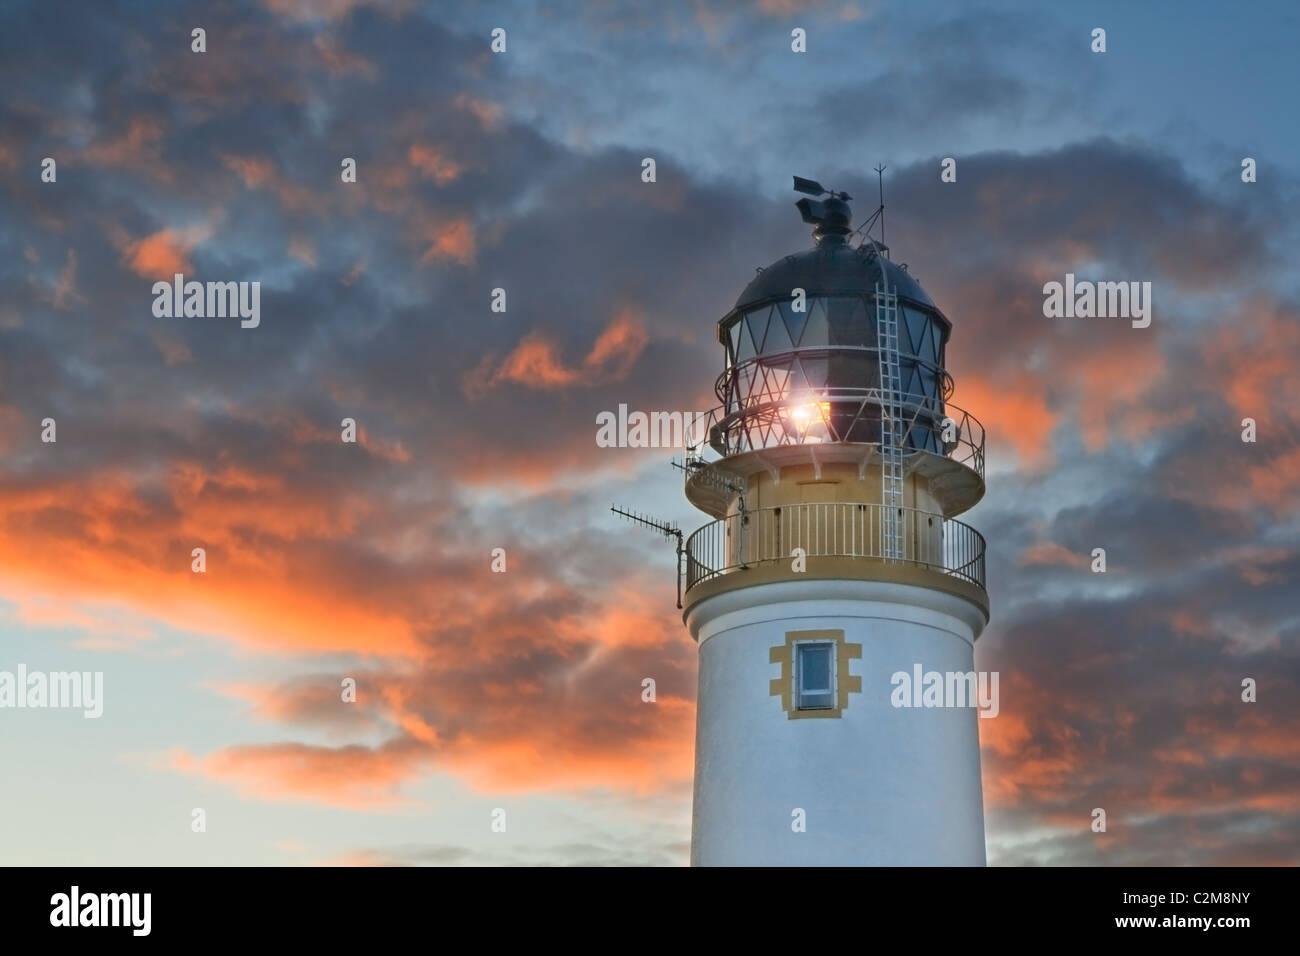 Rua Reidh Lighthouse - Stock Image